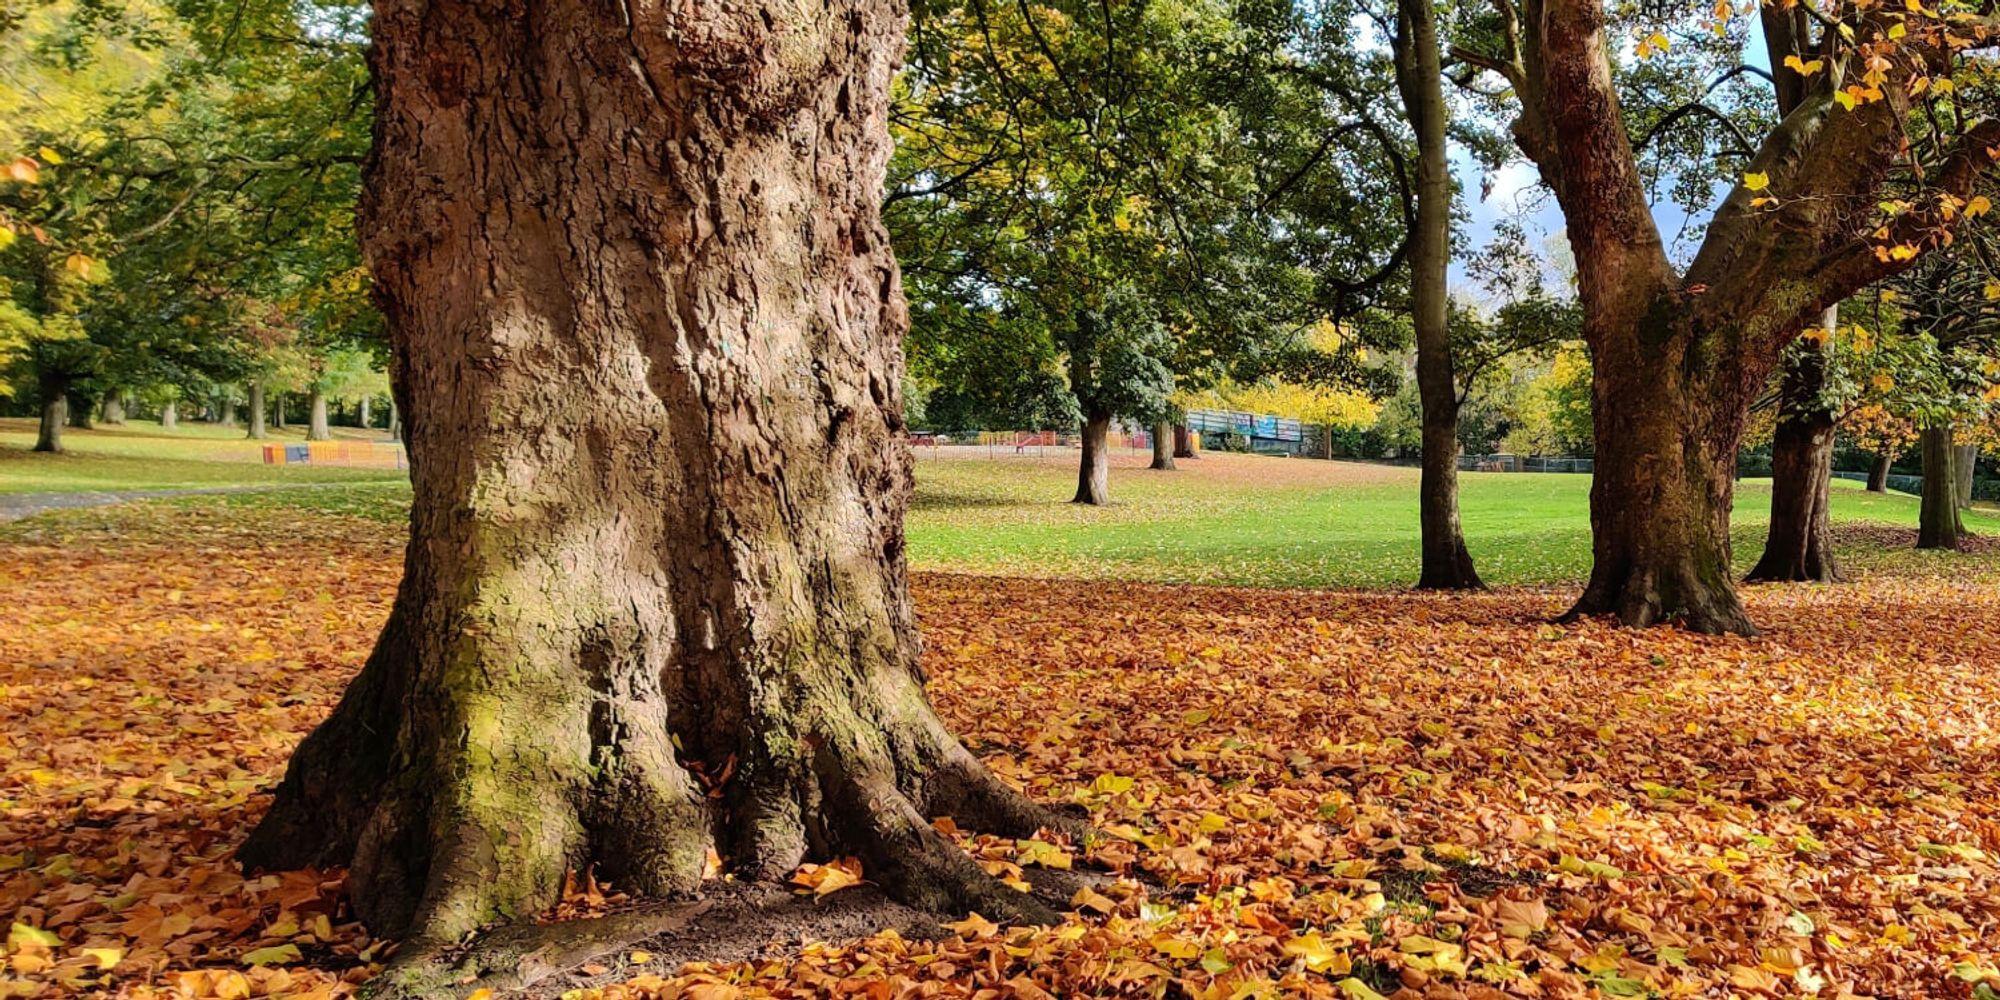 Golden Autumn leaves in Burley Park